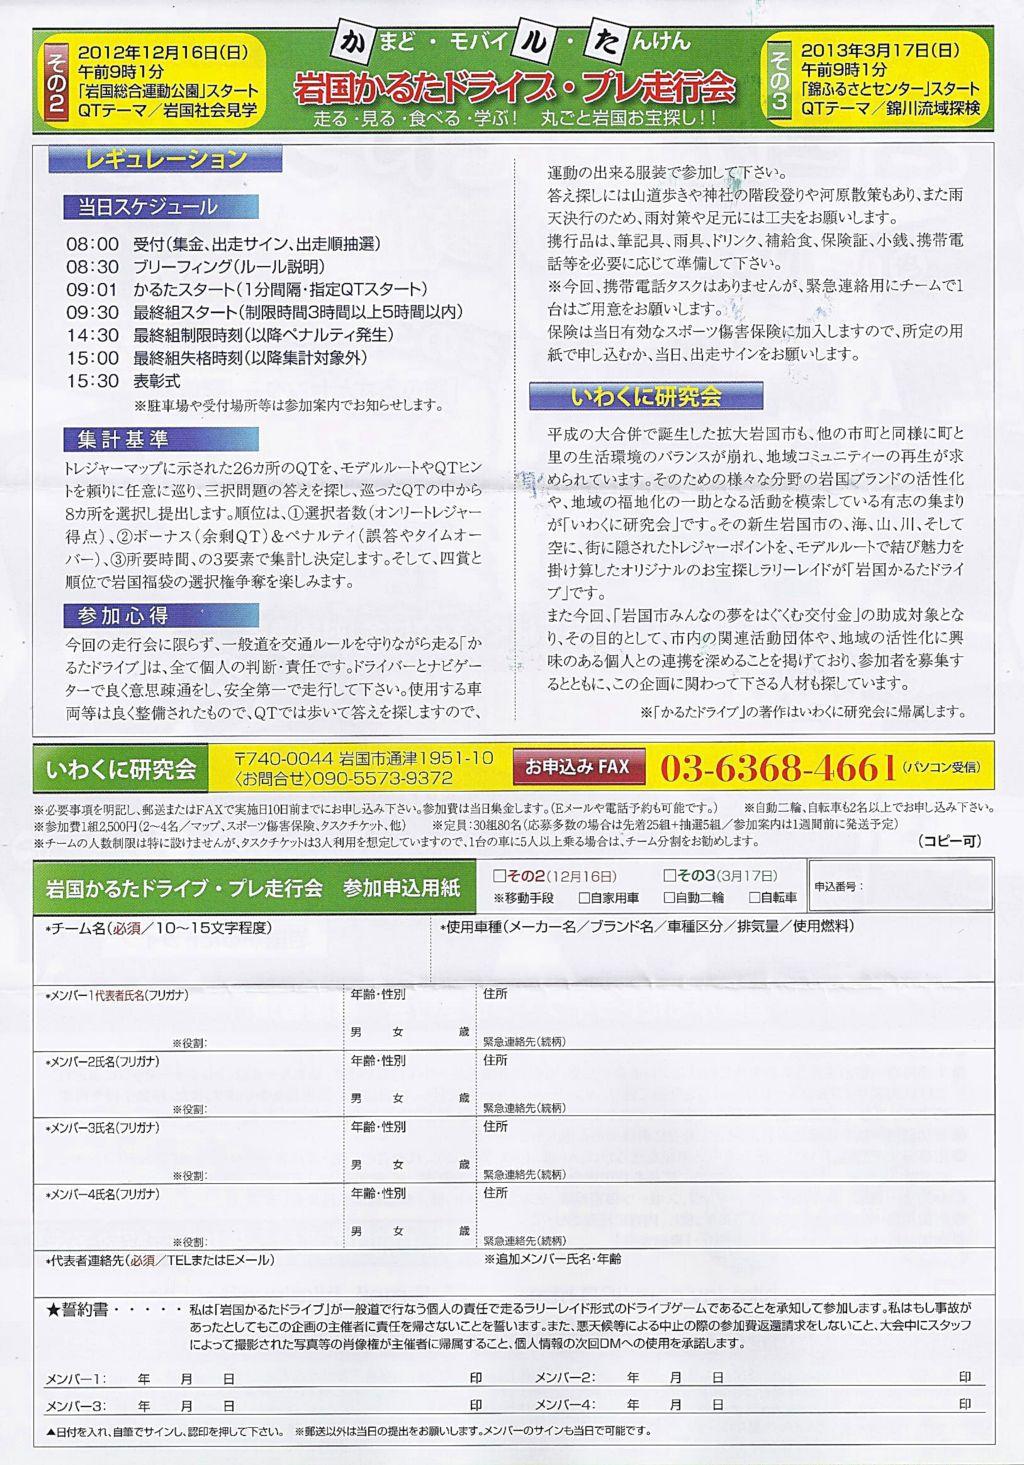 Scan_20130125_16_R.jpg